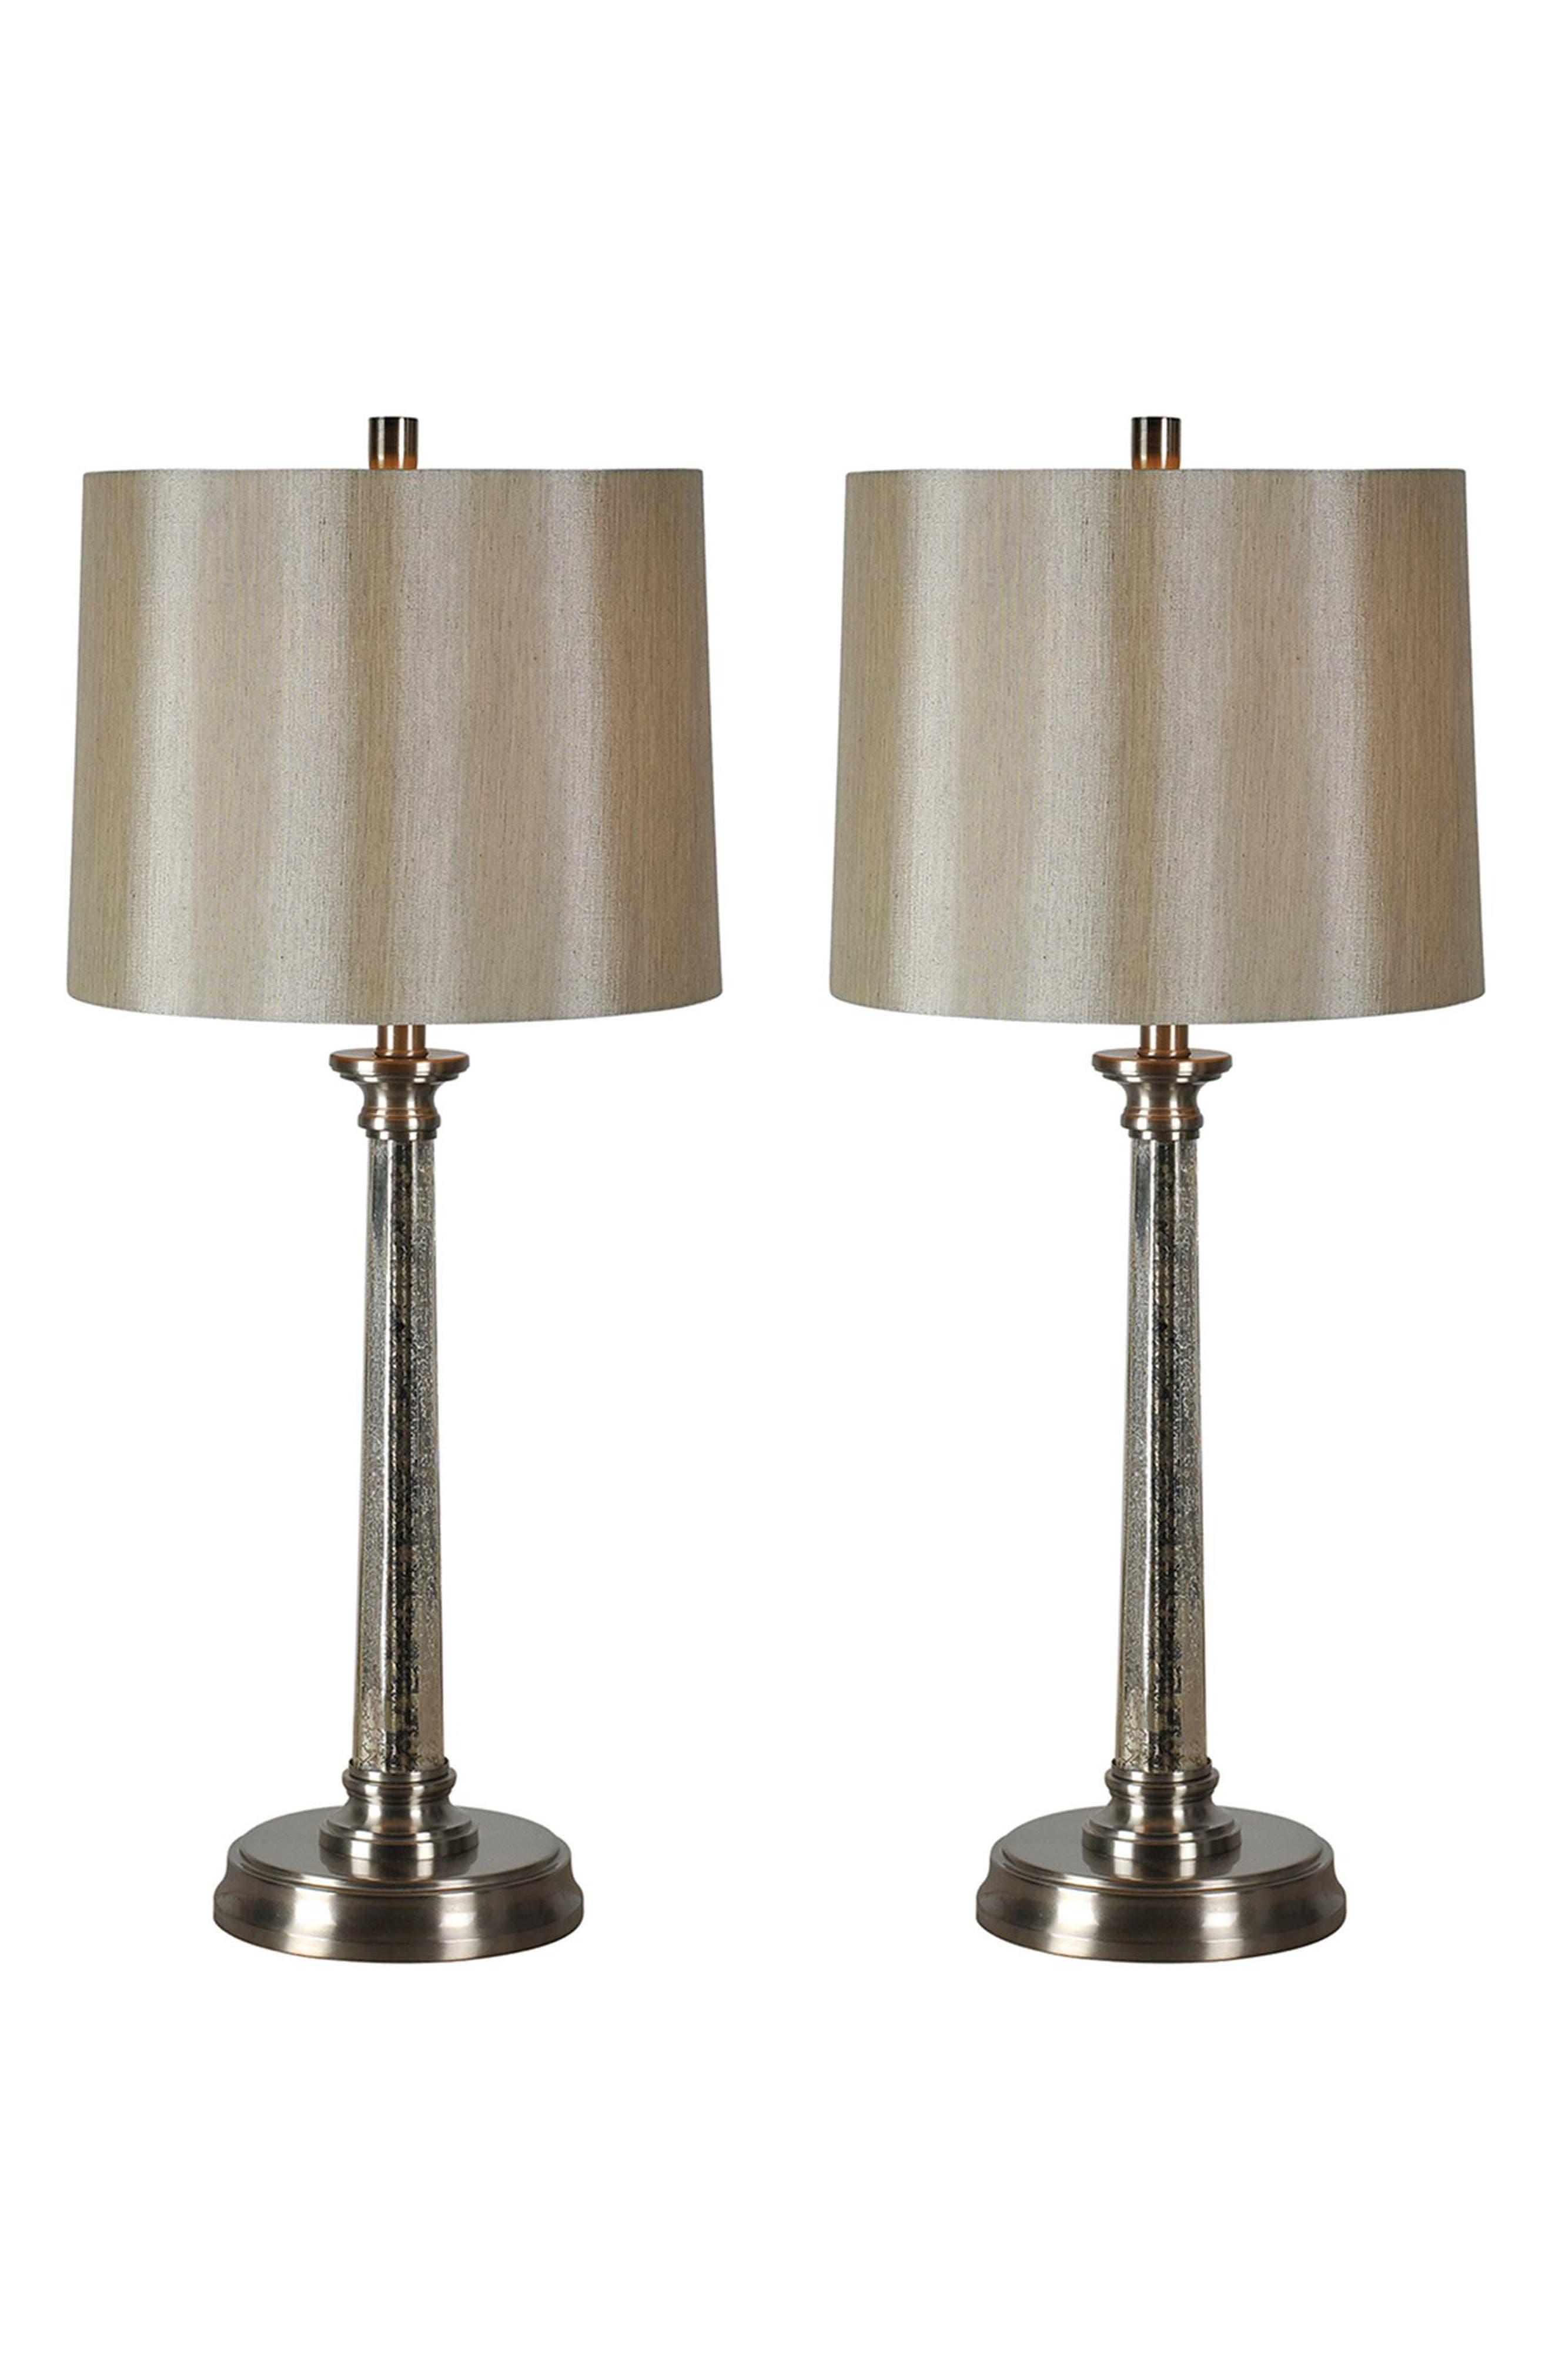 Brooks Set of 2 Table Lamps,                             Main thumbnail 1, color,                             SATIN NICKEL